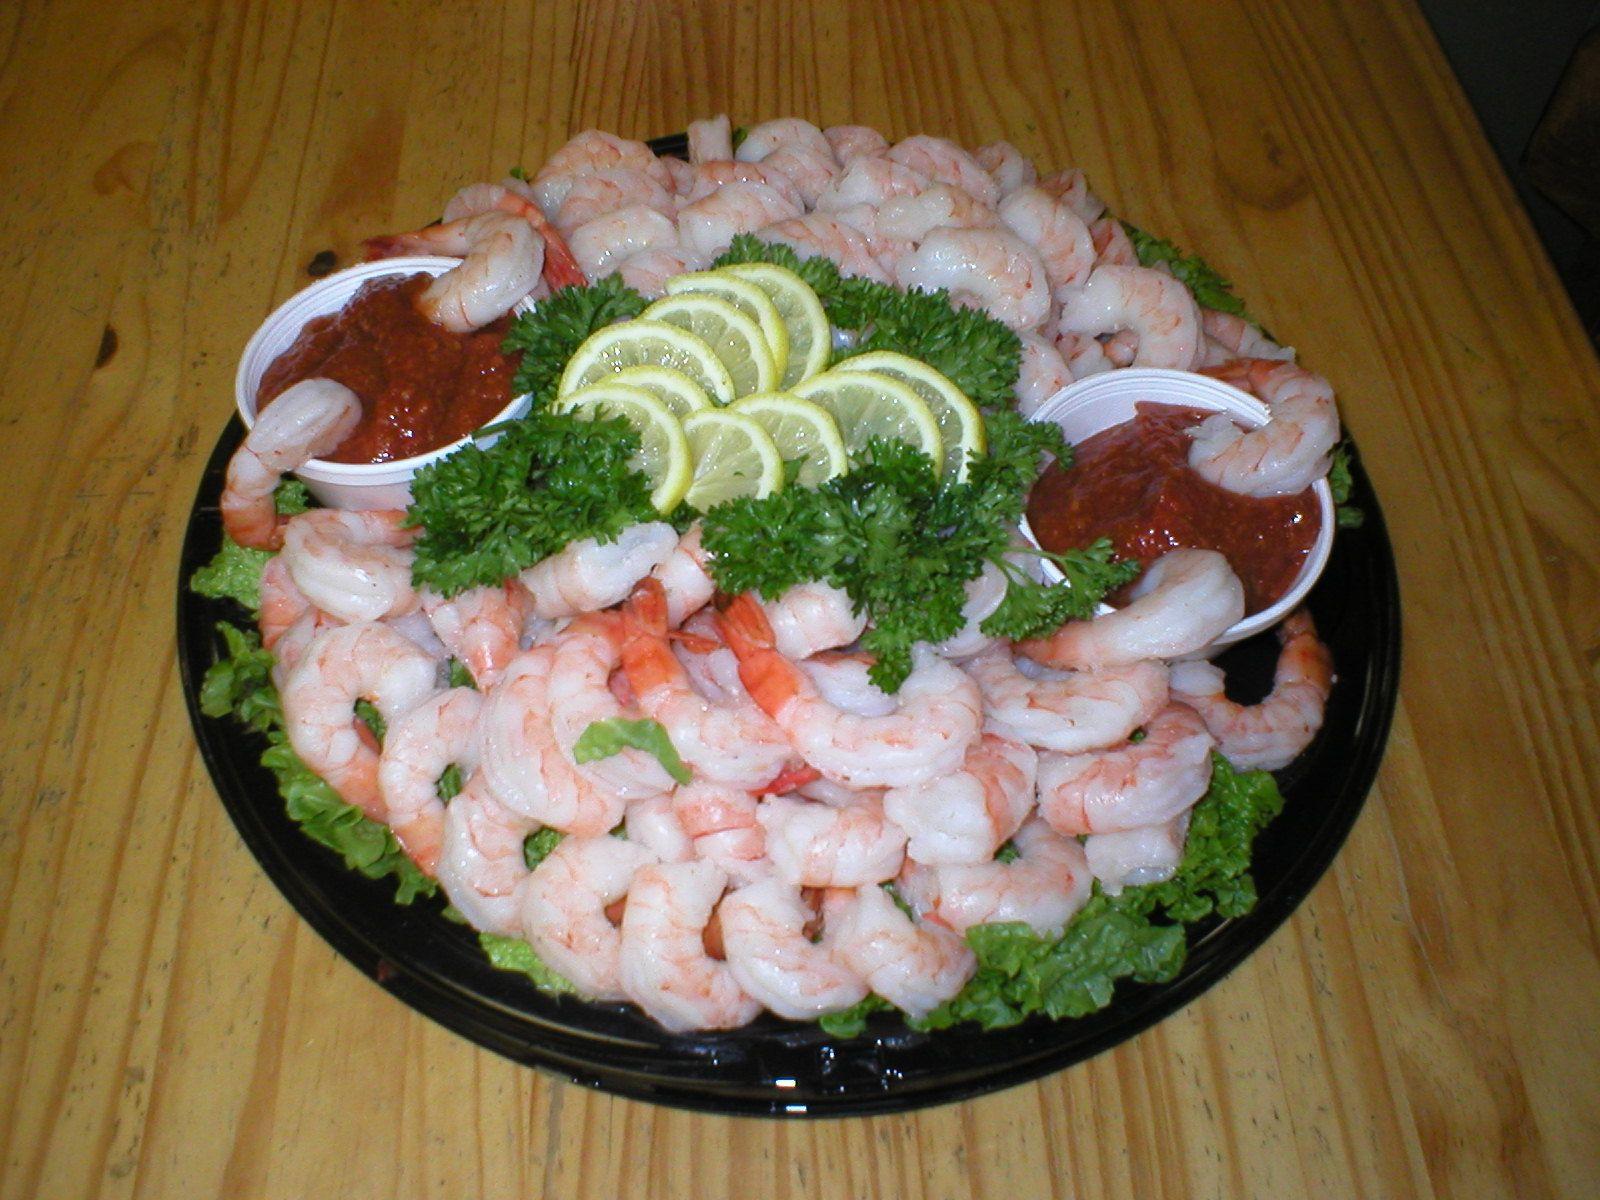 Party Platter Ideas Images